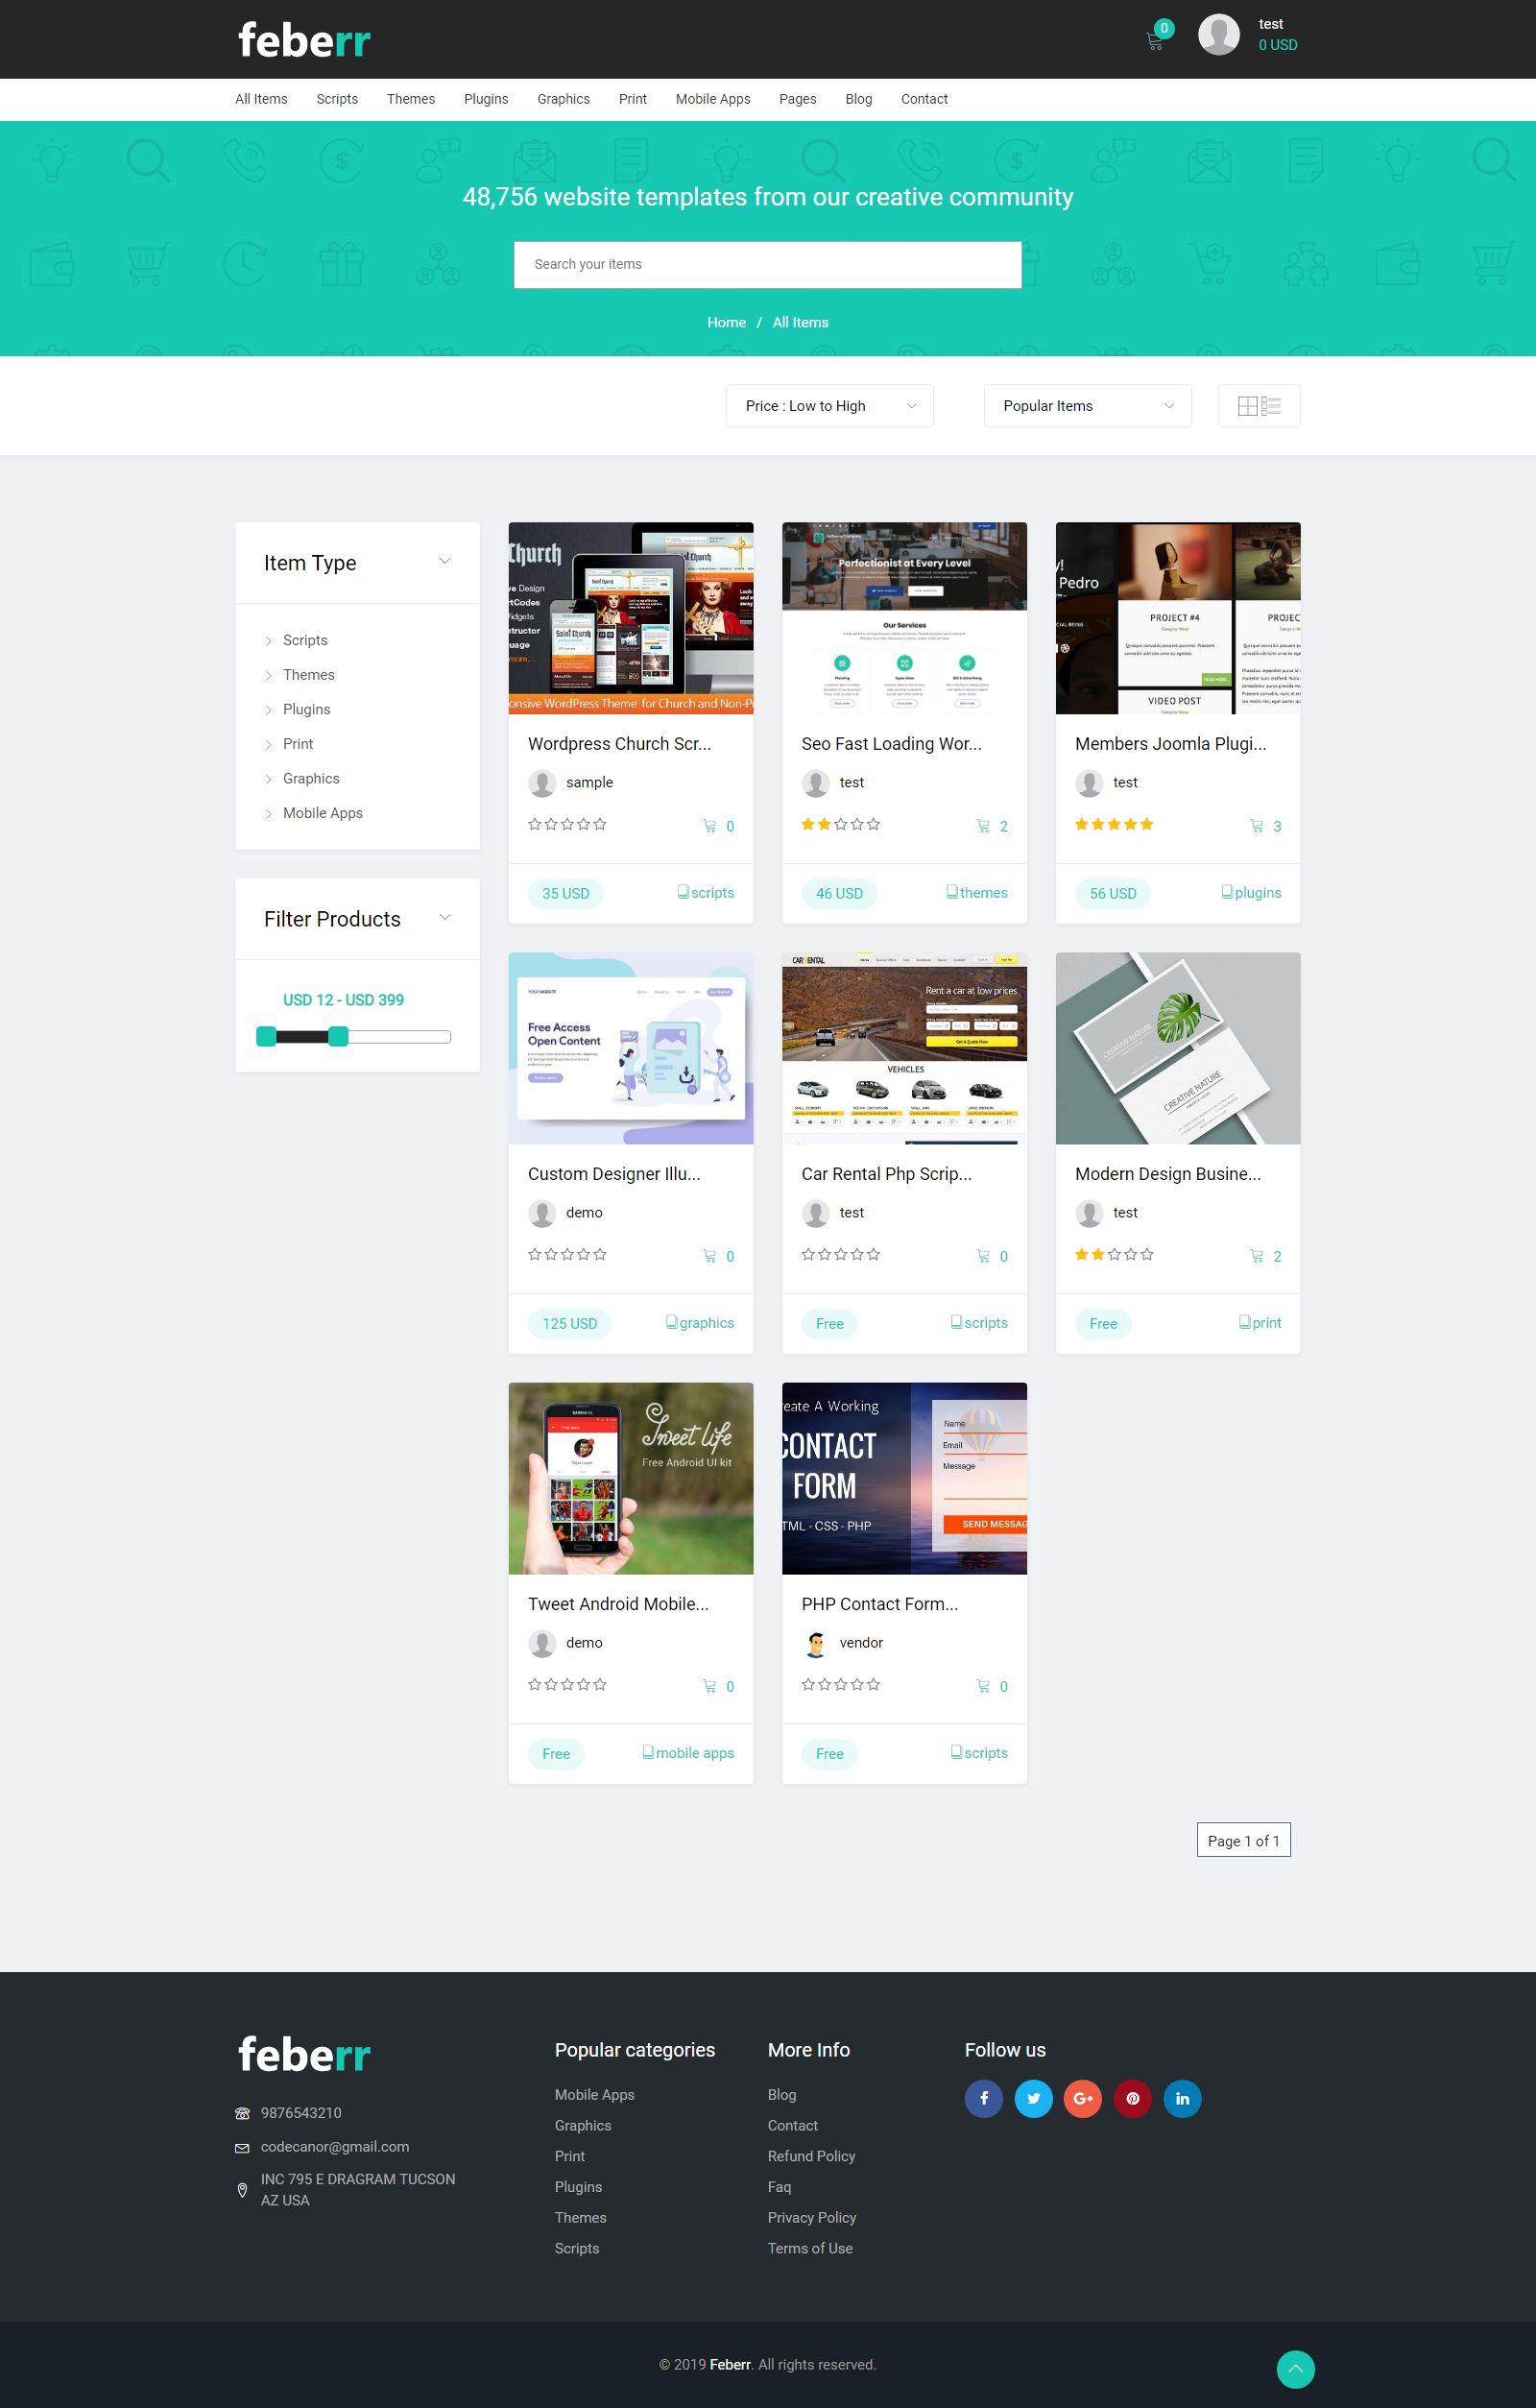 Feberr Multivendor Digital Products Marketplace